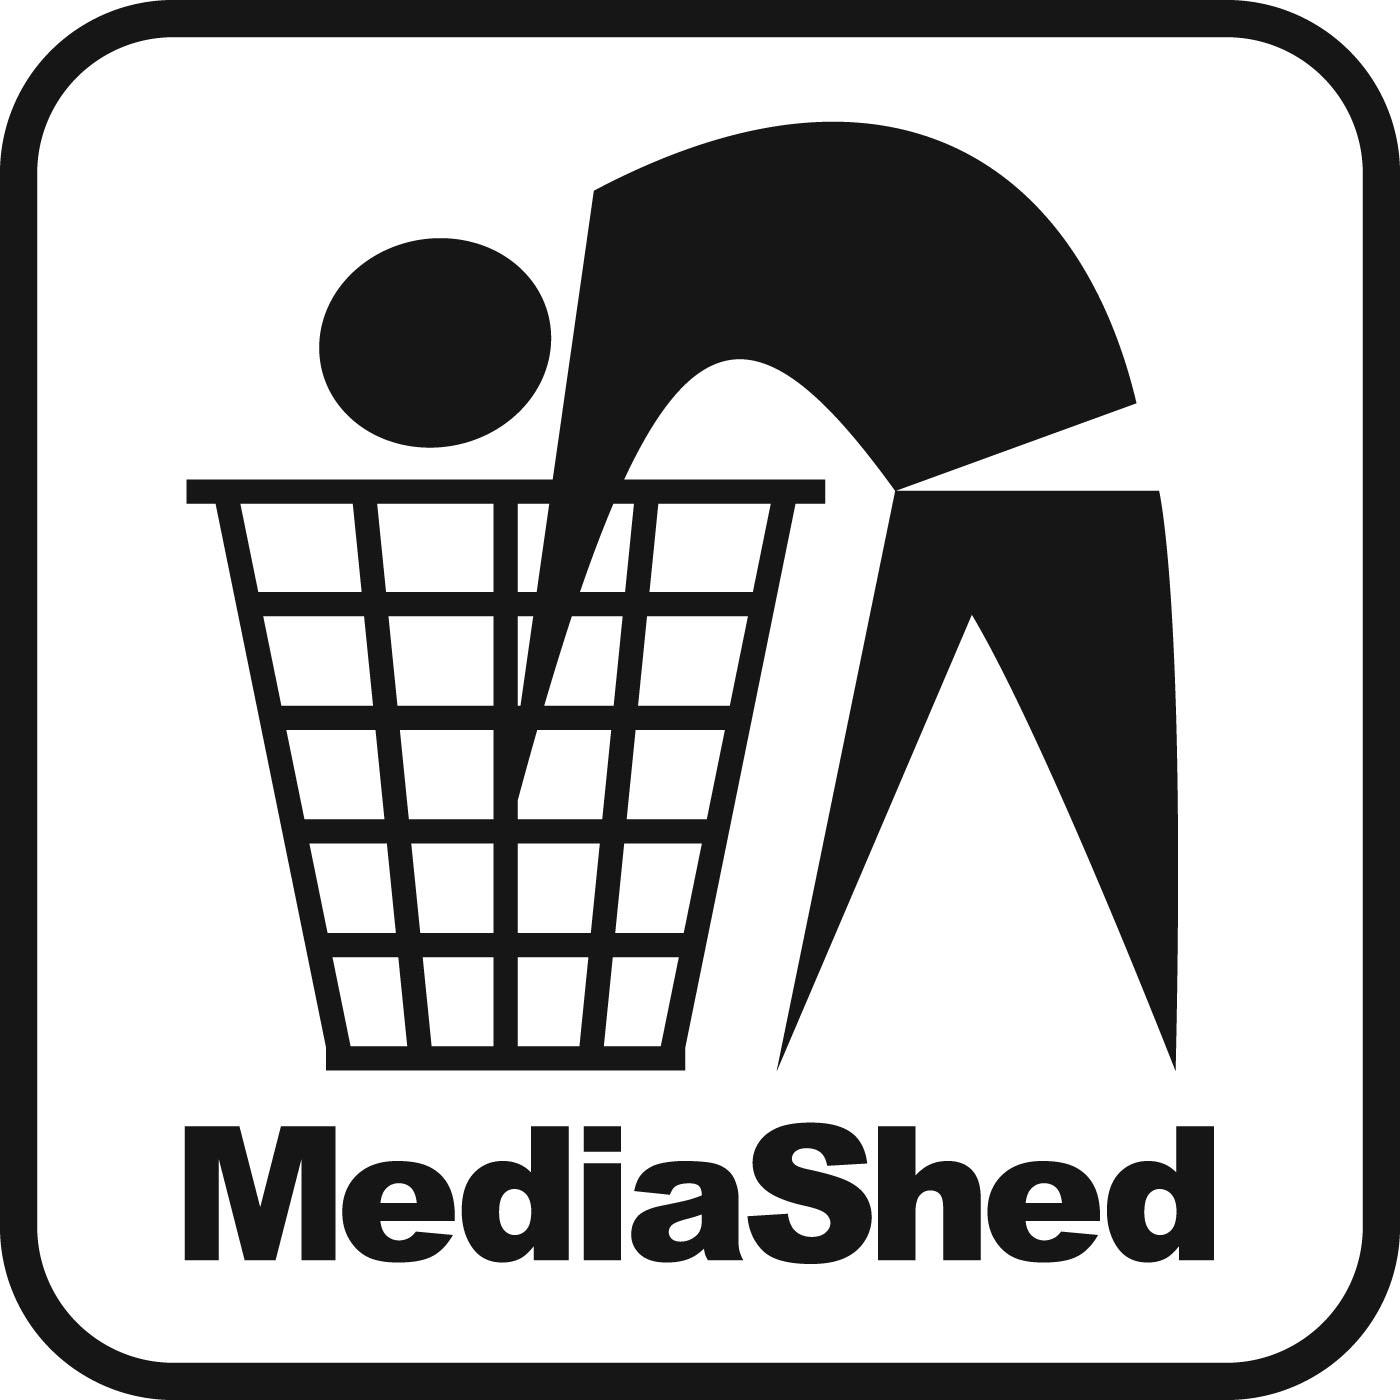 mediashed_logo_1400.jpg